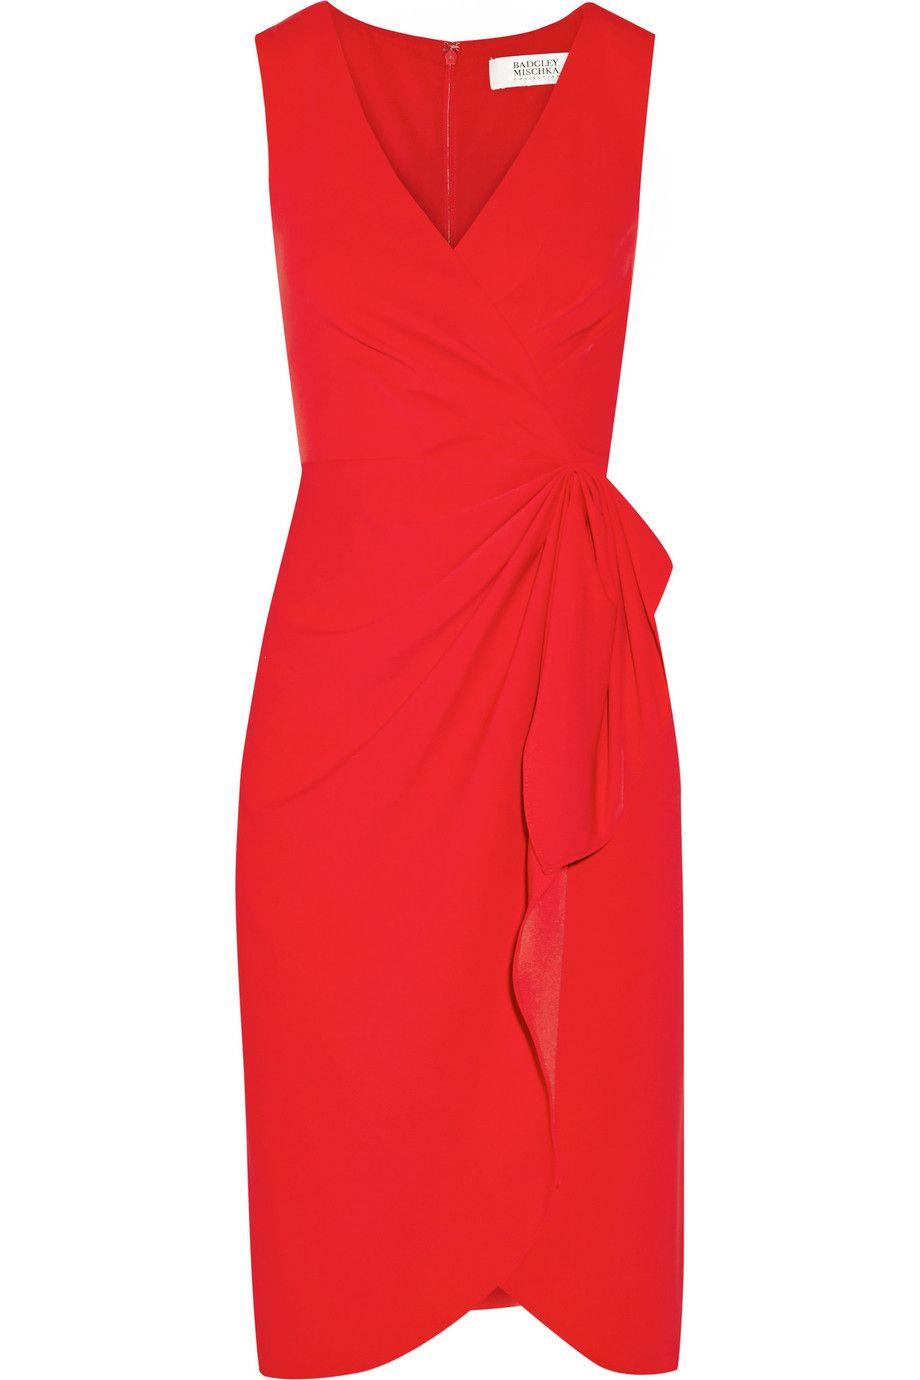 BADGLEY MISCHKA Stretch-cady dress. #badgleymischka #cloth #dress